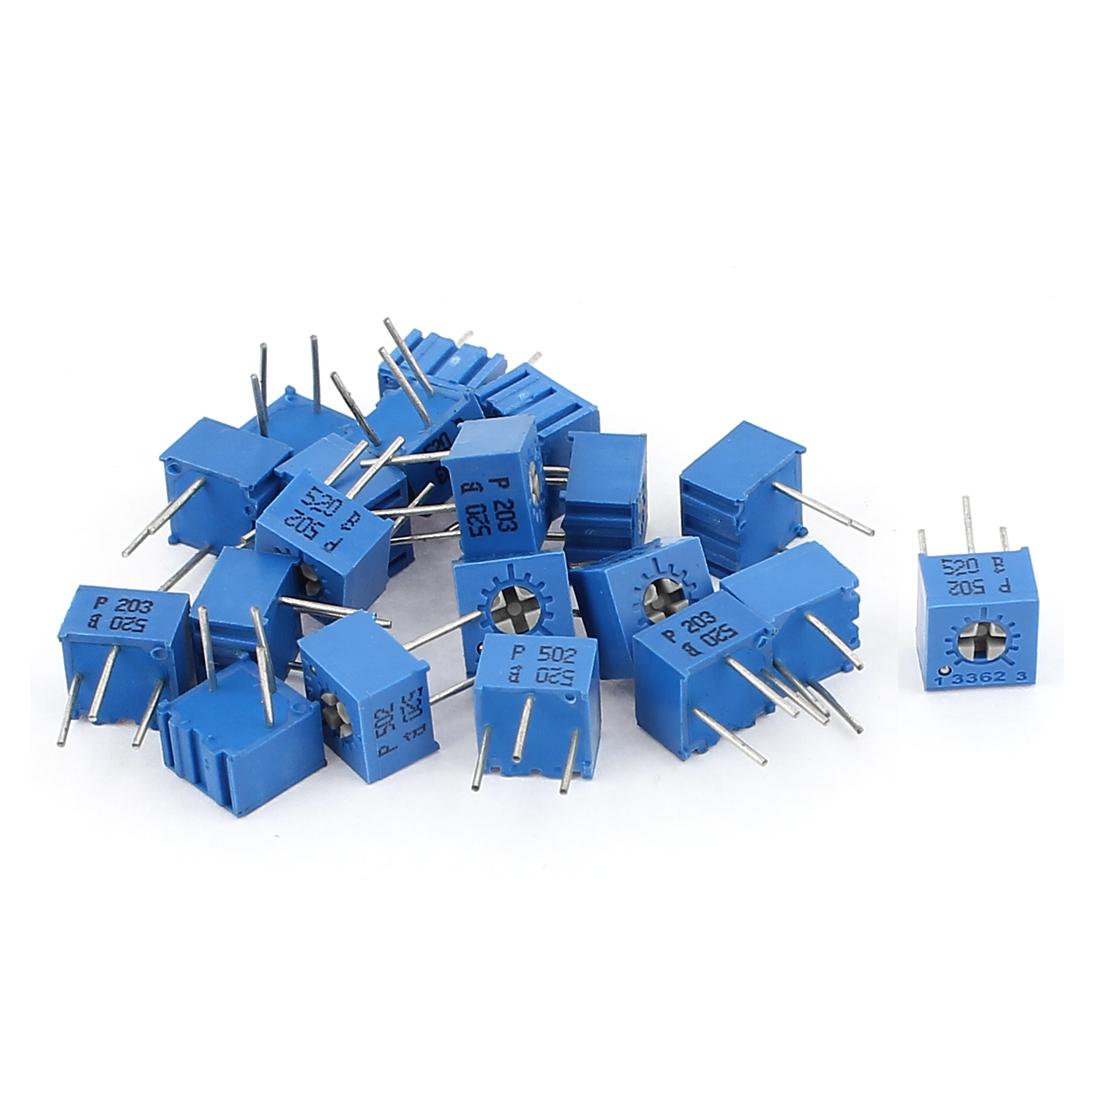 20Pcs Potentiometer Trimmer Variable Resistor 3362P-203 3362P-502